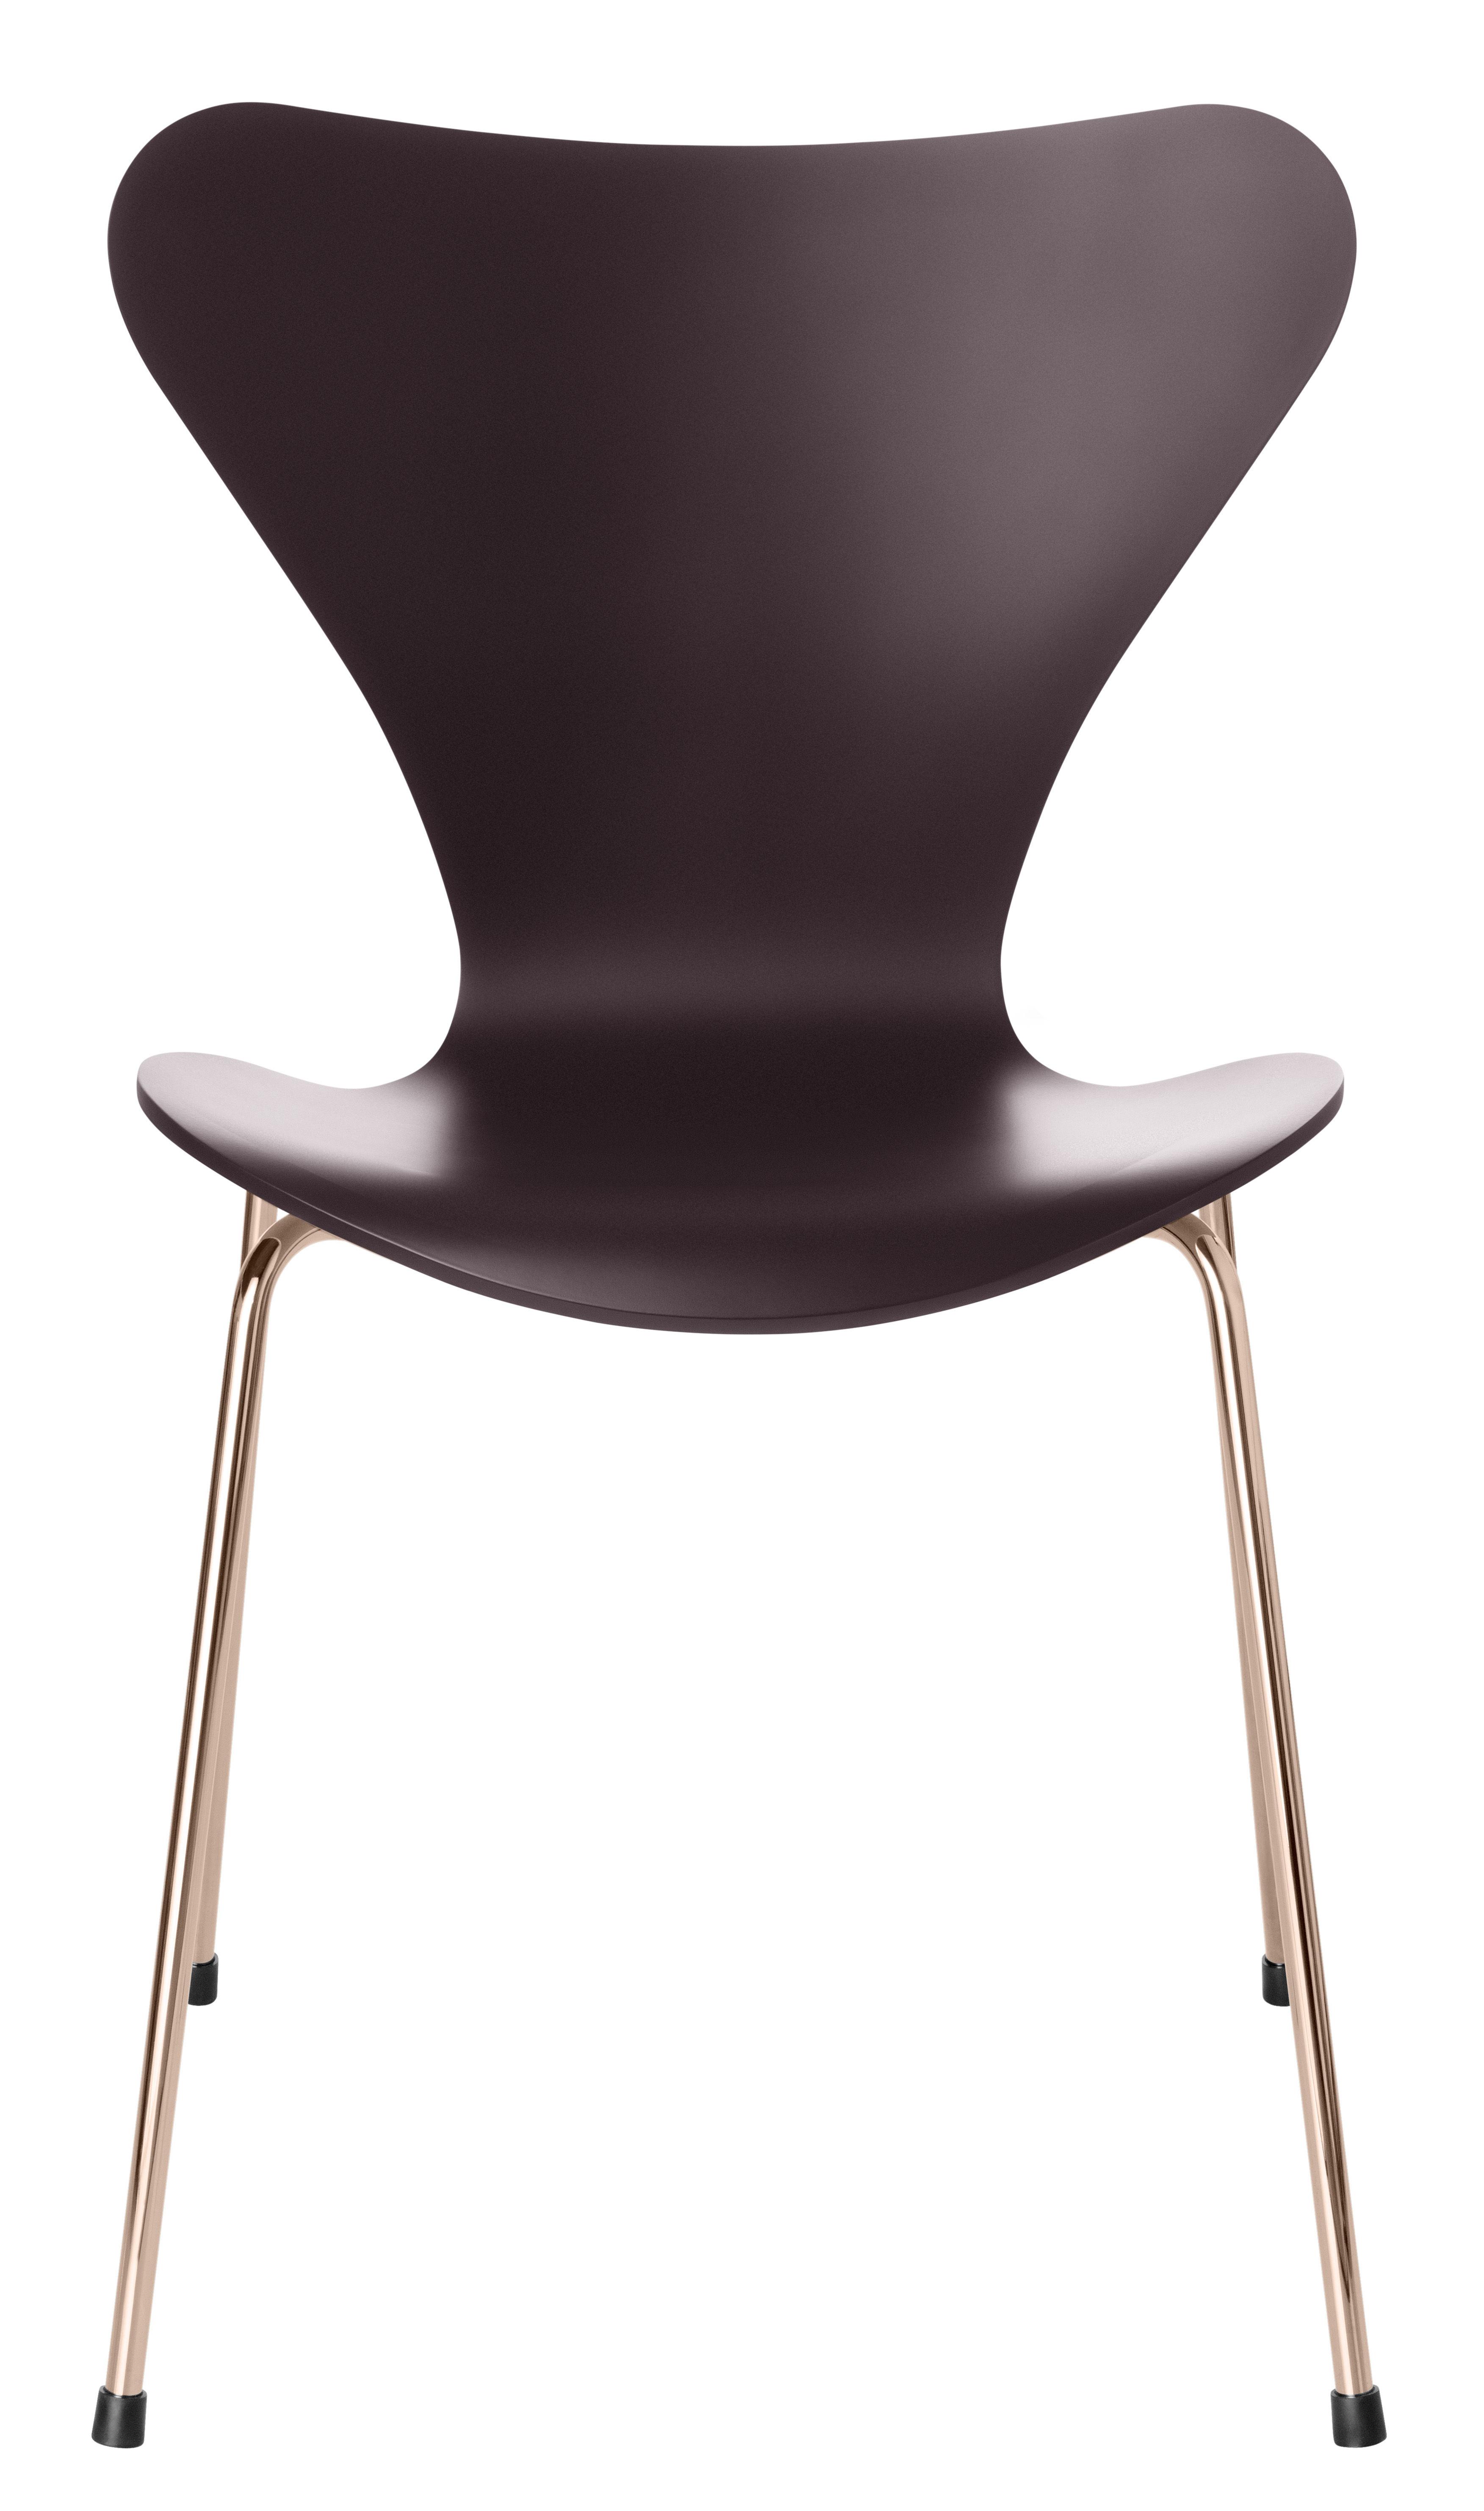 s rie 7 stapelbarer stuhl 22 kar tiges gold limitierte auflage merlot rot stuhlbeine. Black Bedroom Furniture Sets. Home Design Ideas